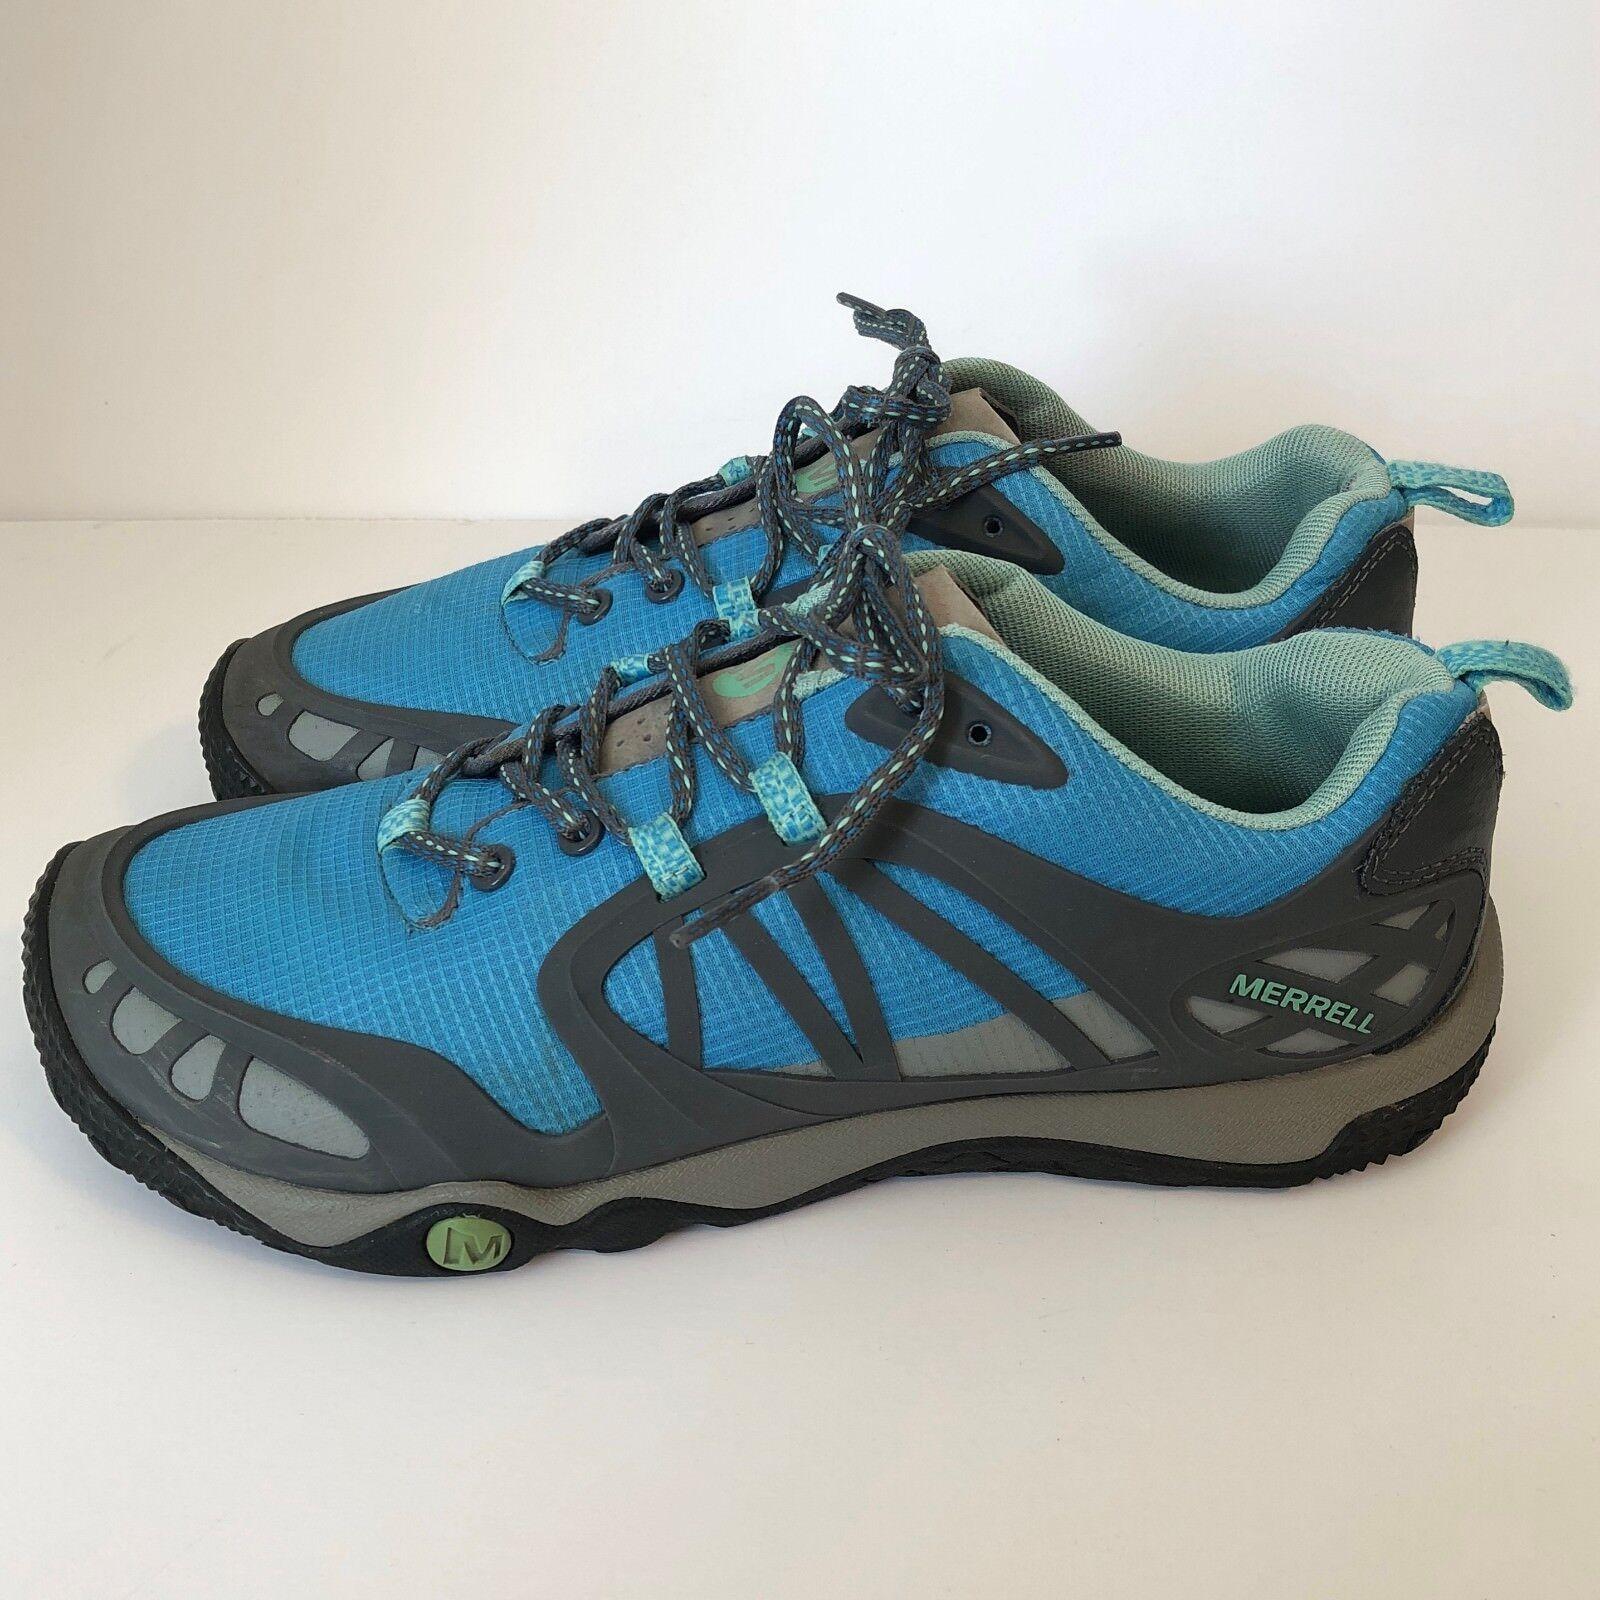 Merrell Women's Hiking shoes Prederra Vim Sport Sea Shore Size 9.5 bluee